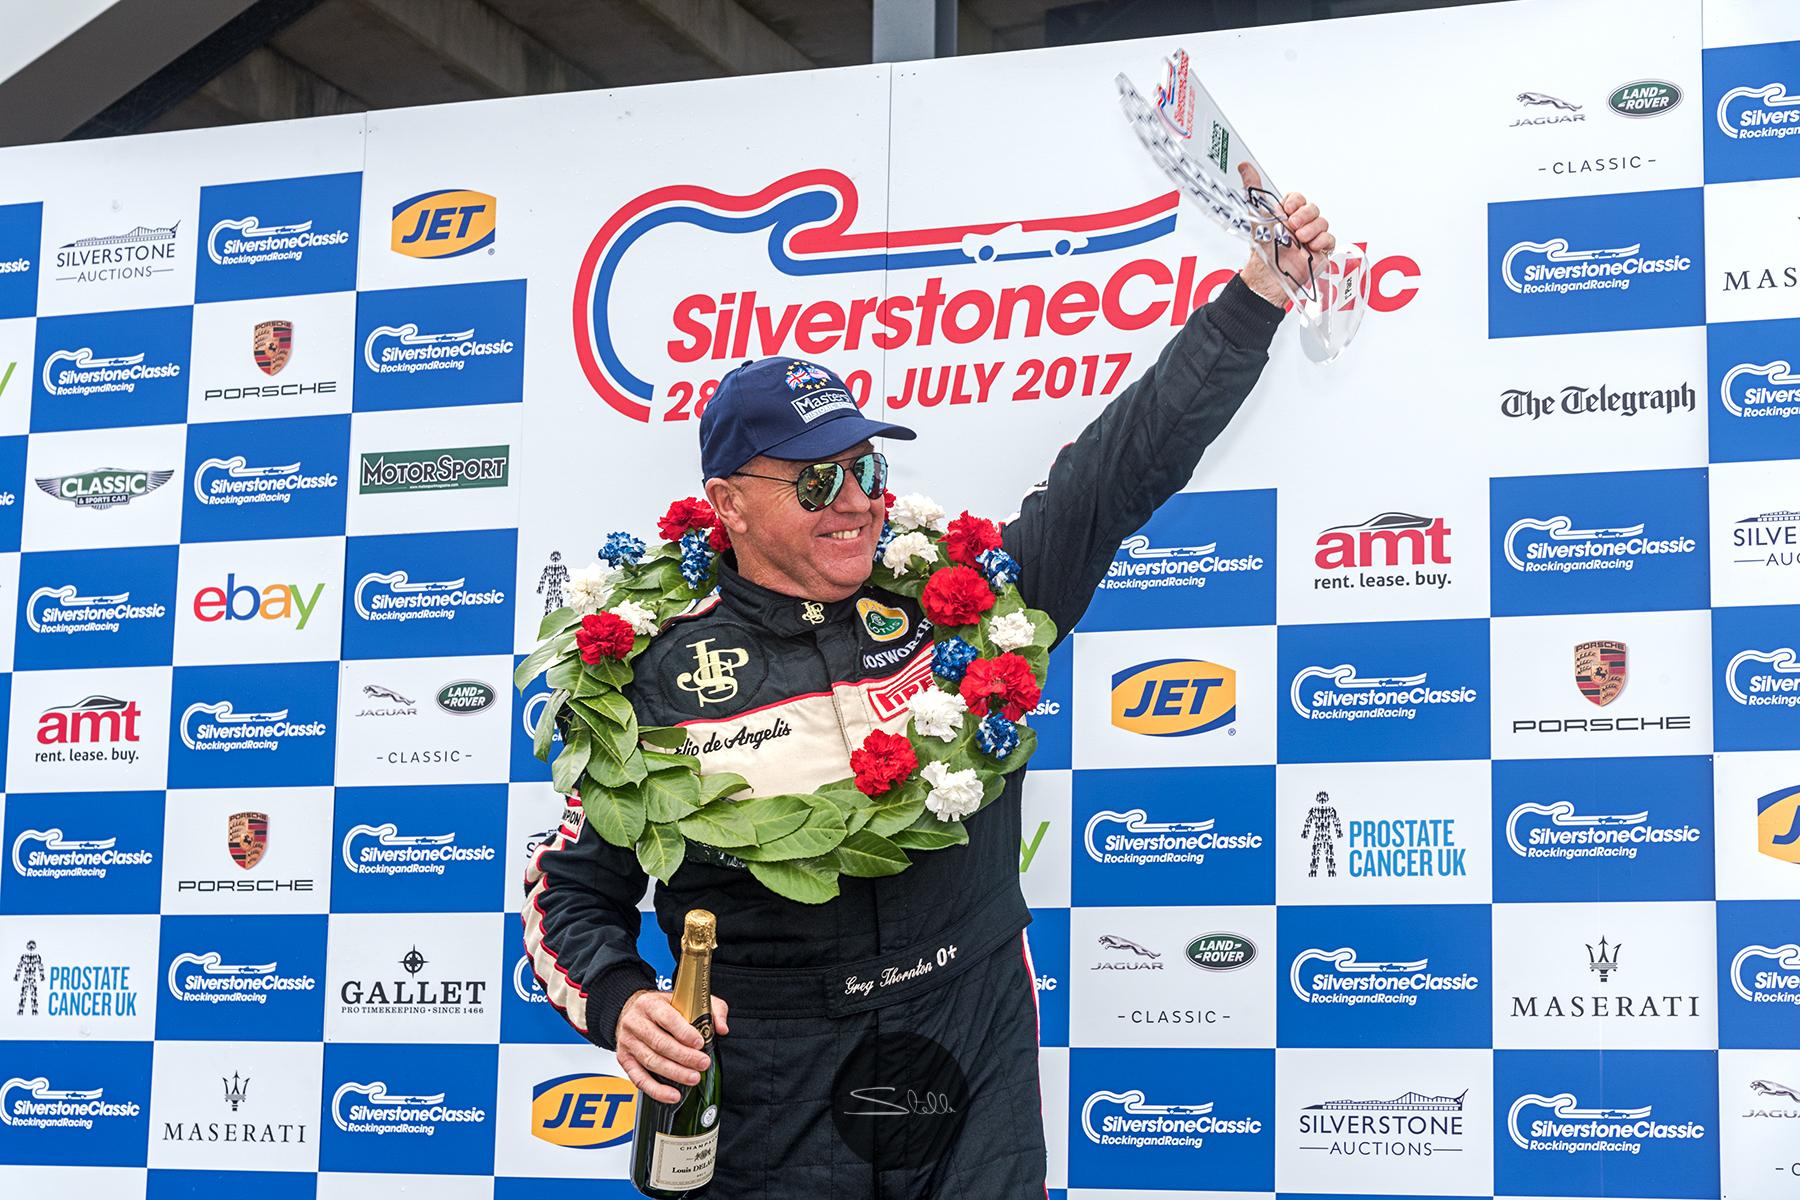 Stella Scordellis Silverstone Classic 2017 68 Watermarked.jpg